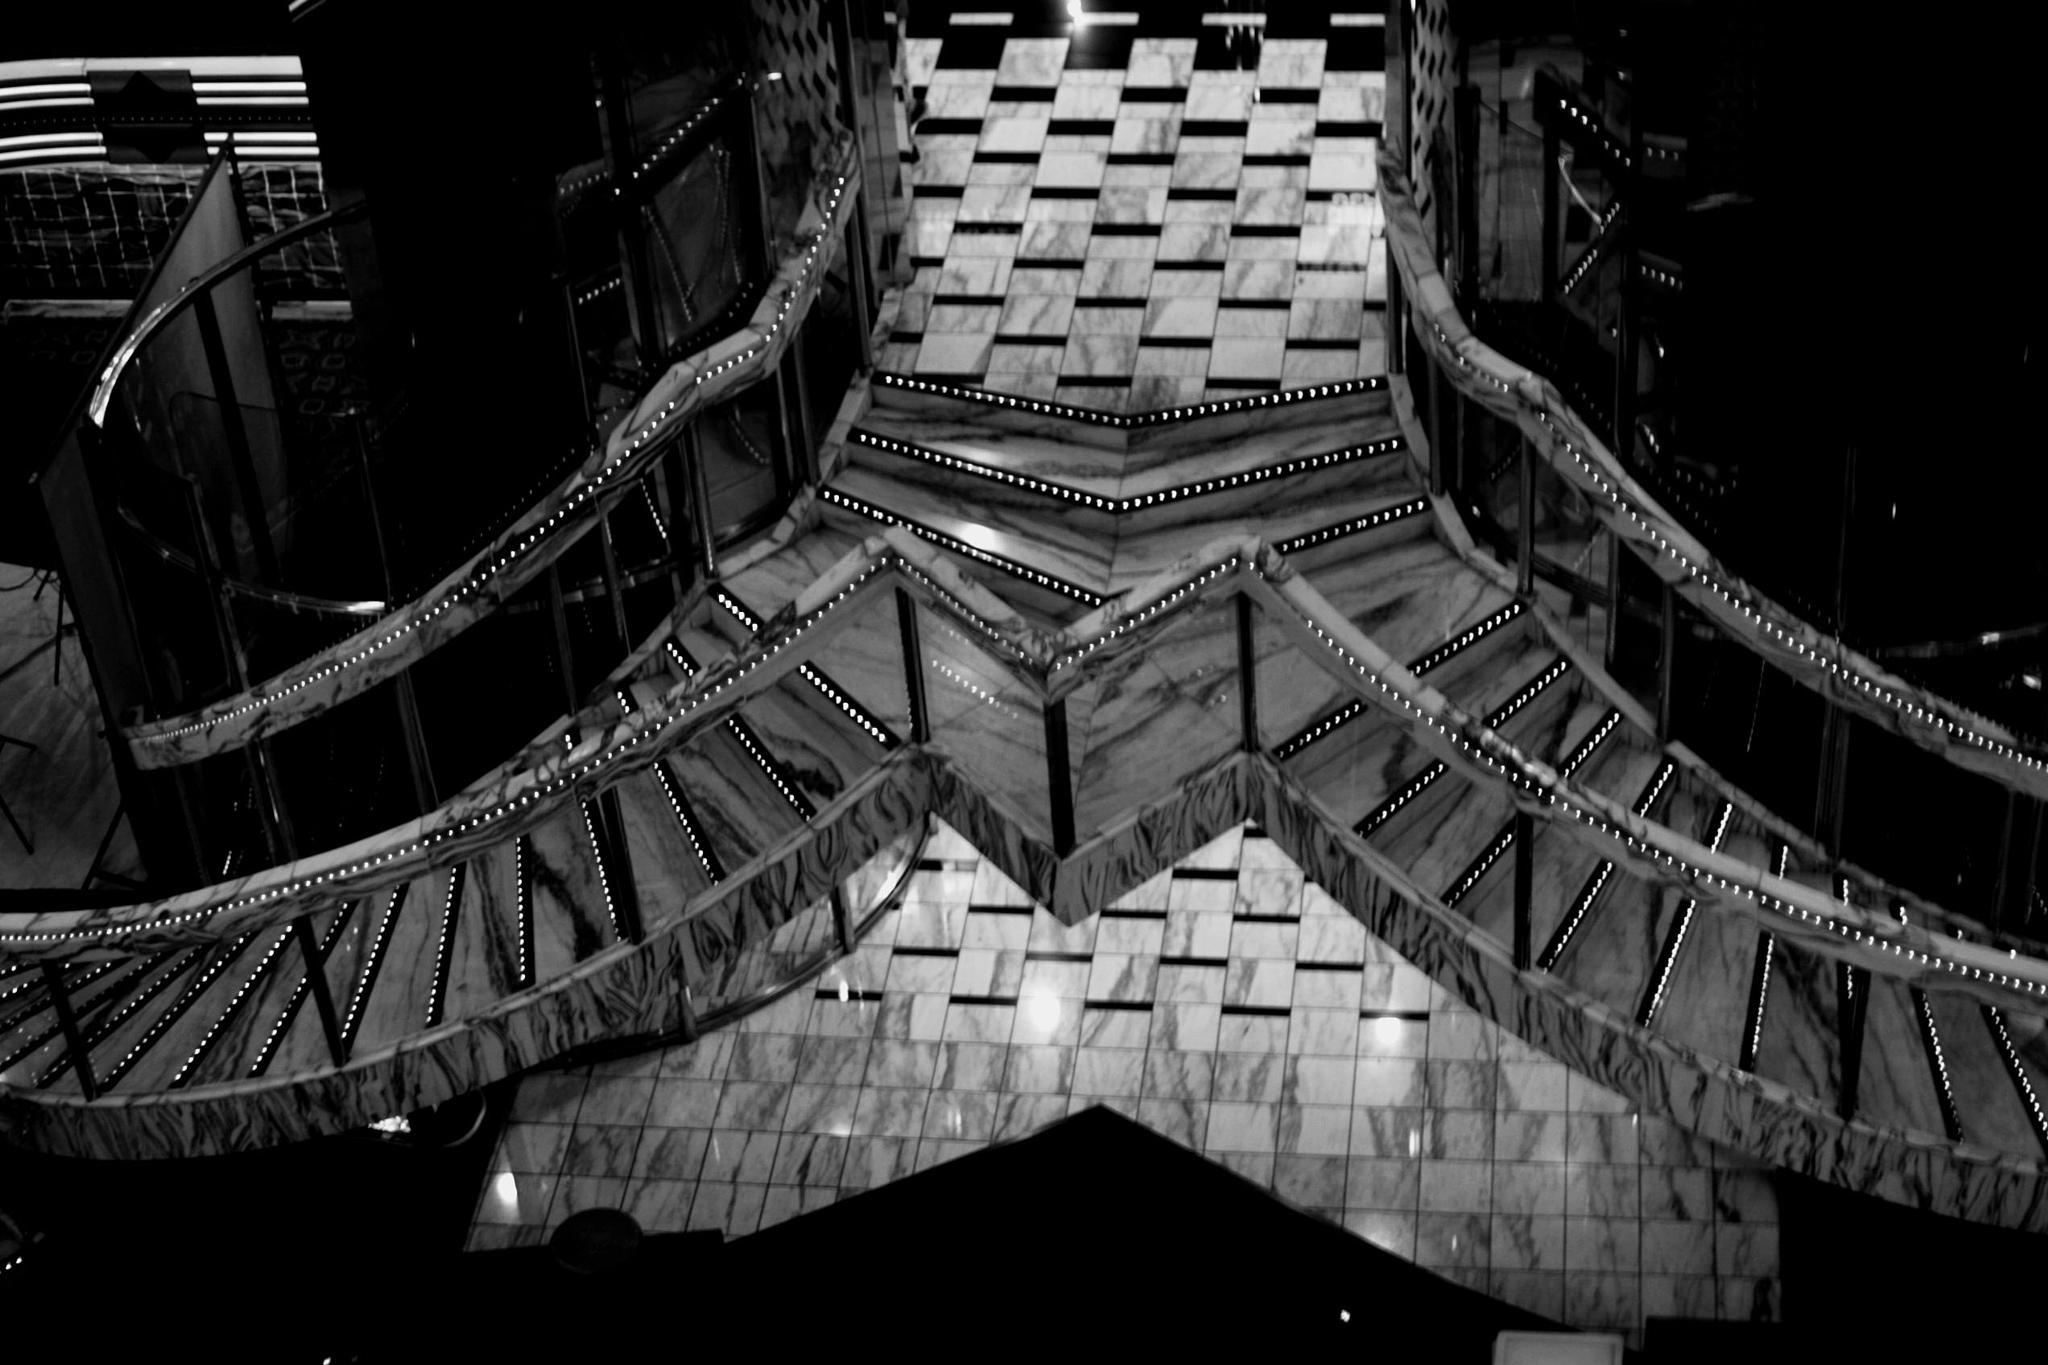 Stairways to hell by Antoni Marek Polczyk